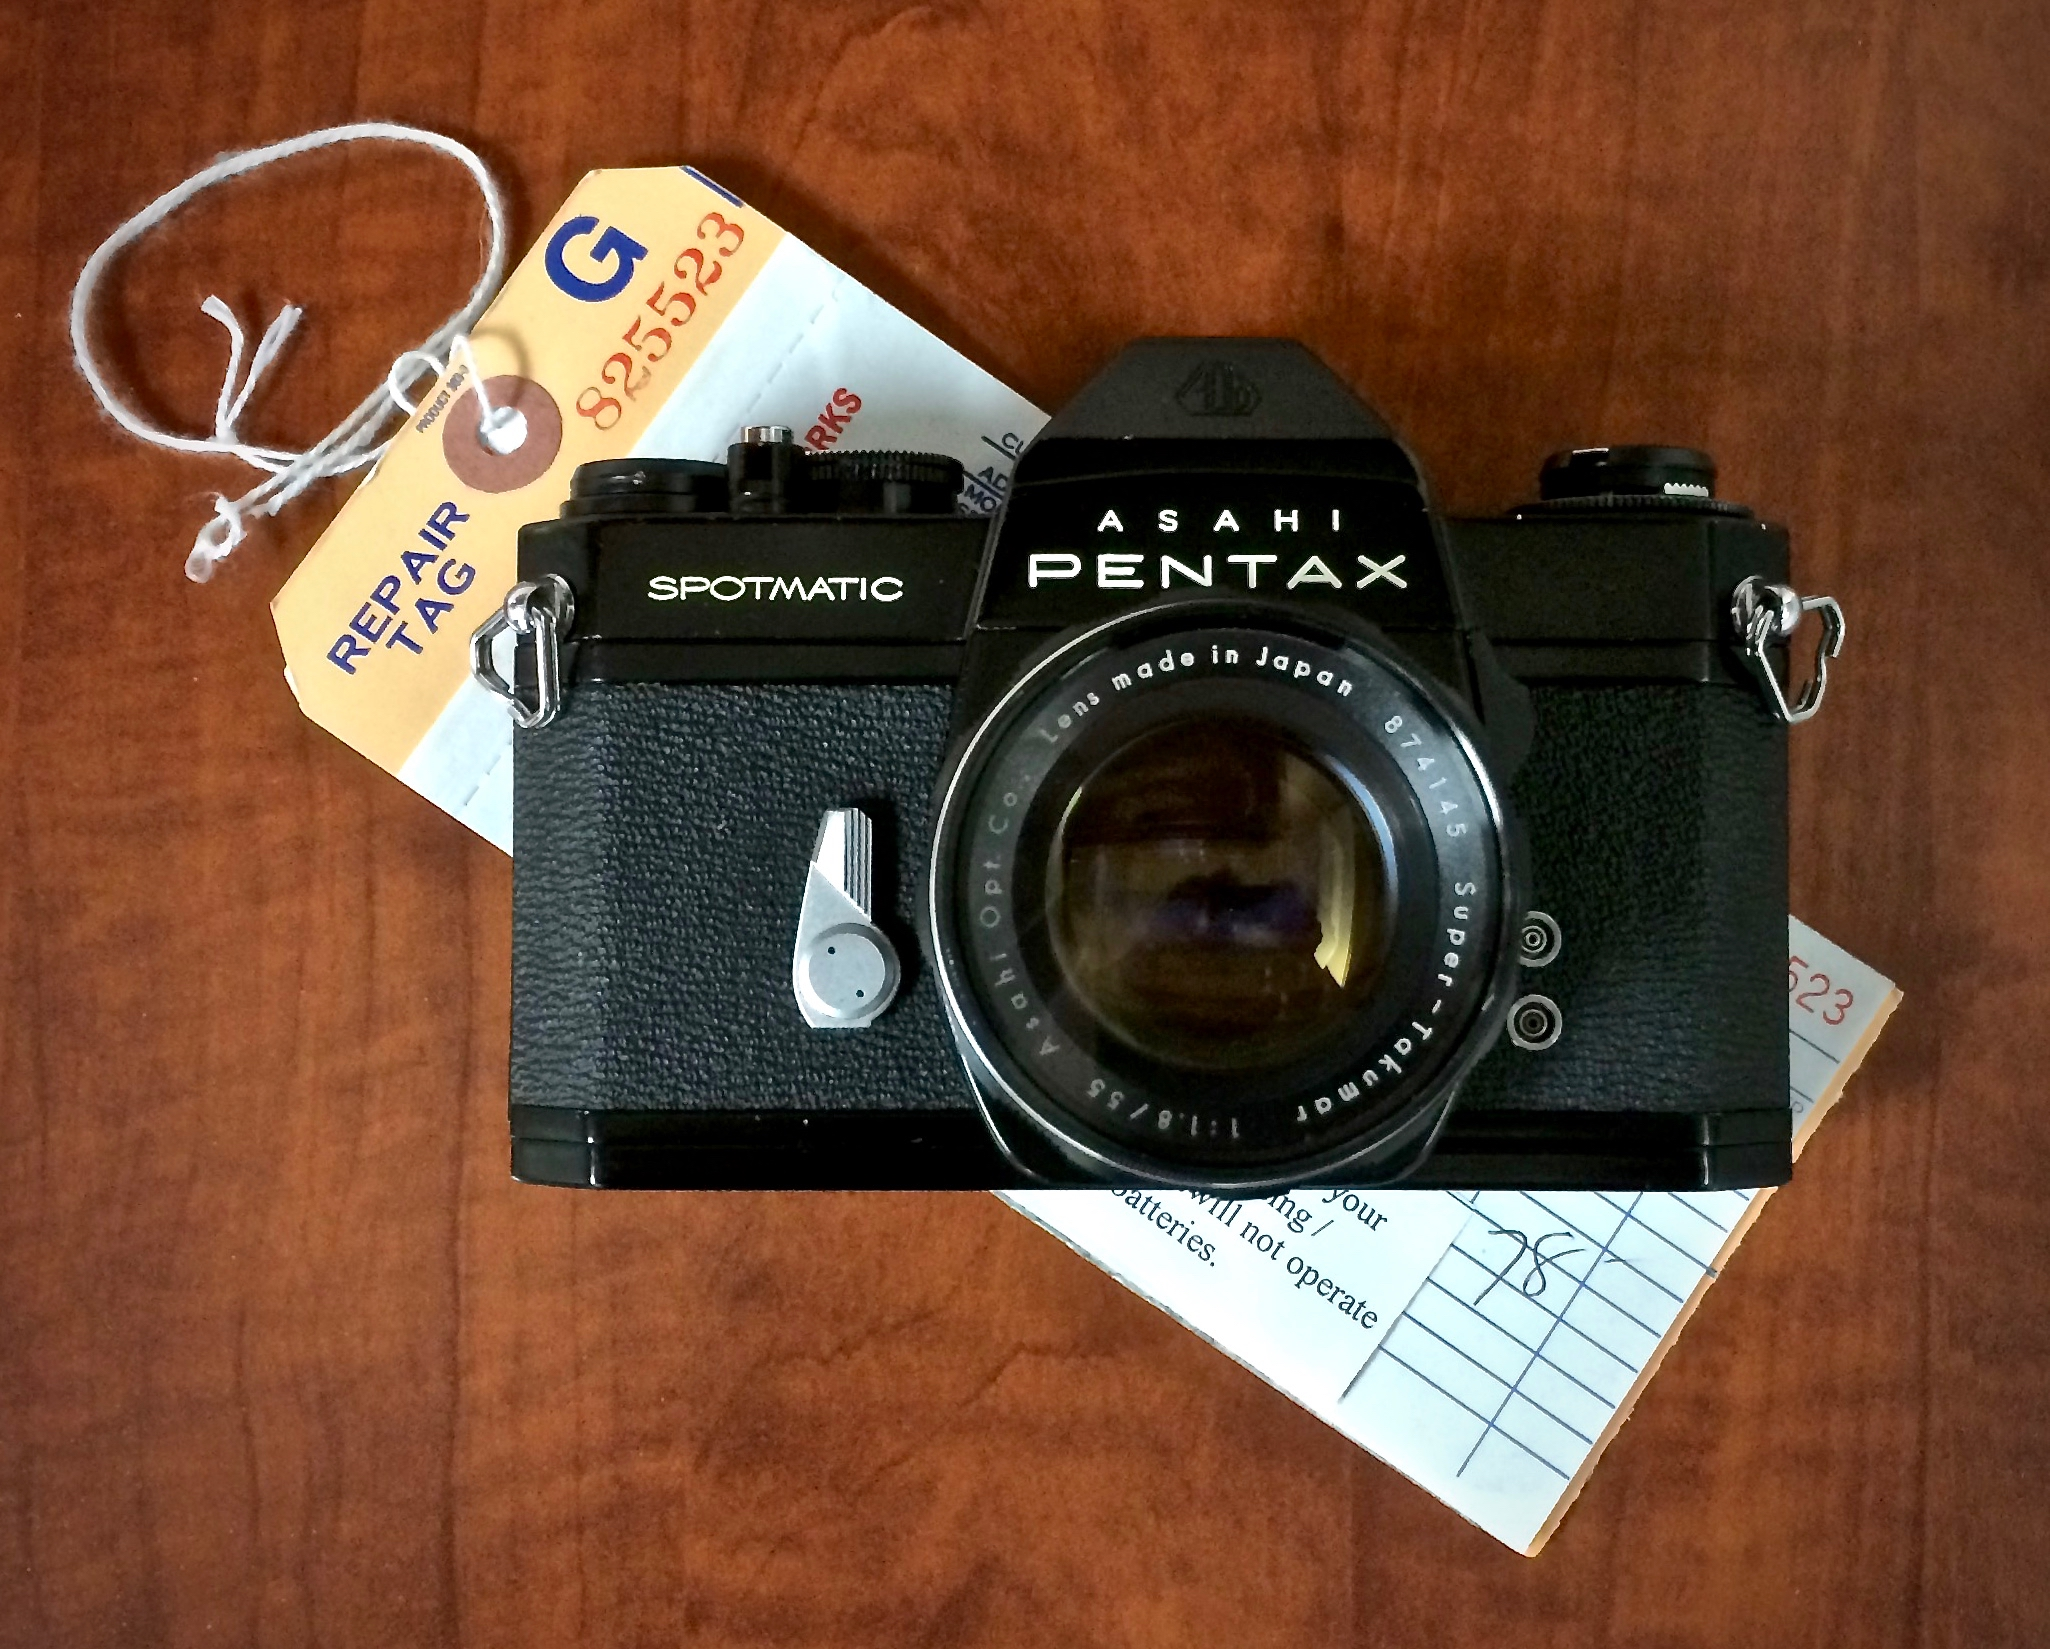 Pentax Spotmatic SPII fresh from the shop